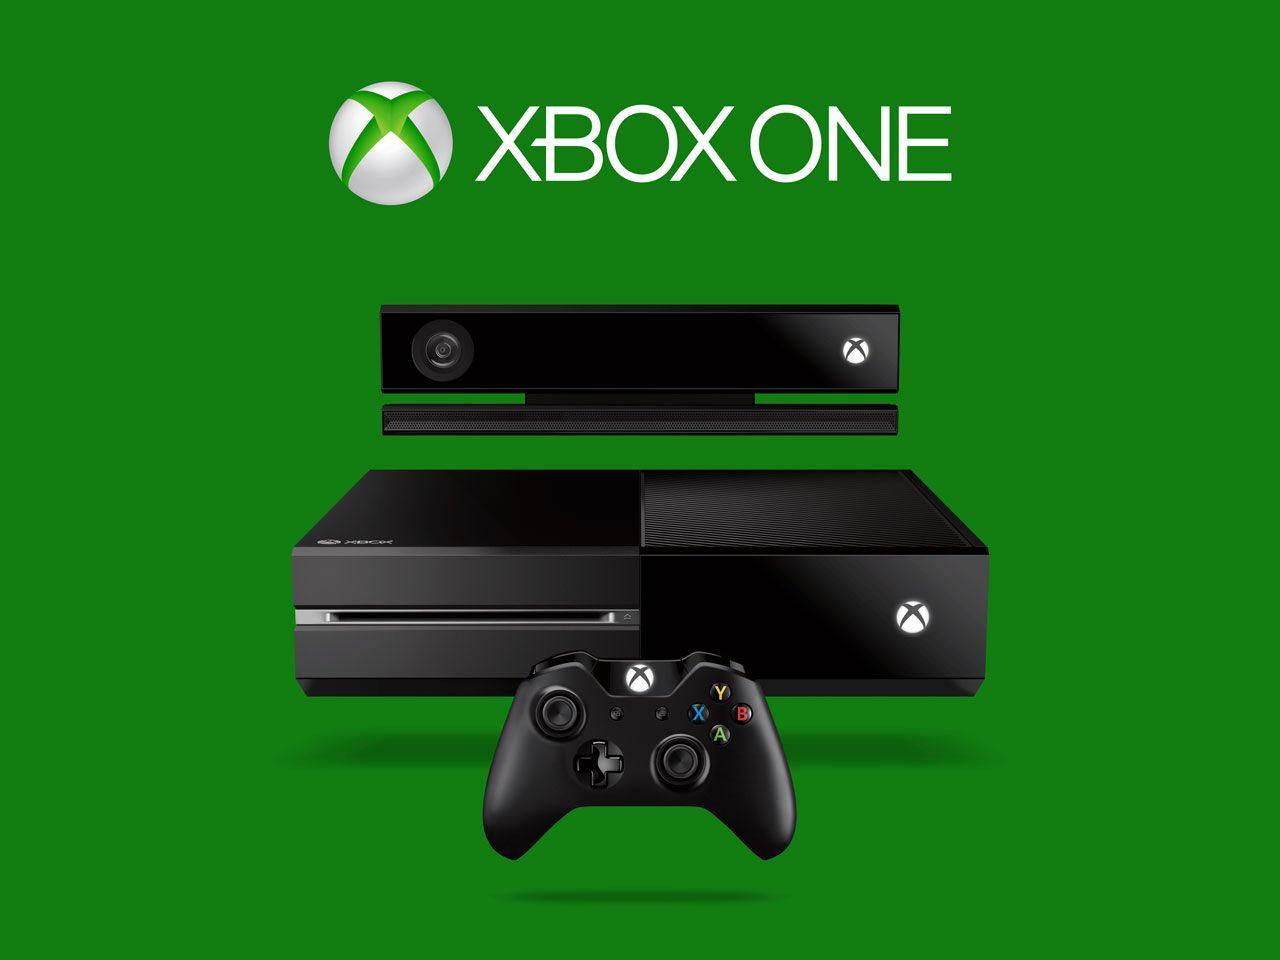 Игровая консоль Microsoft Xbox One + Kinect